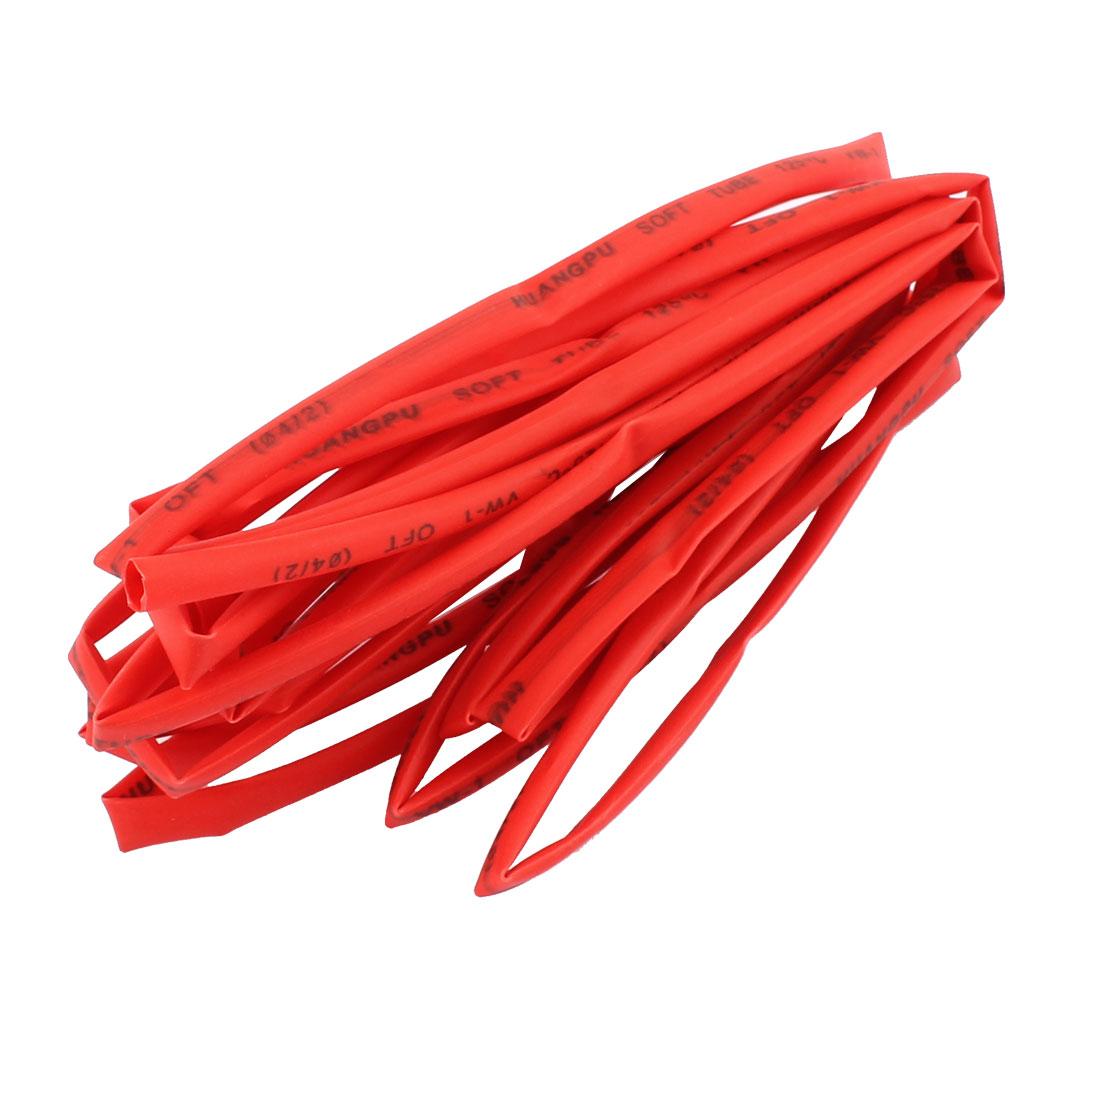 4M Length 4mm Dia Polyolefin Heat Shrinkable Tube Sleeving Red